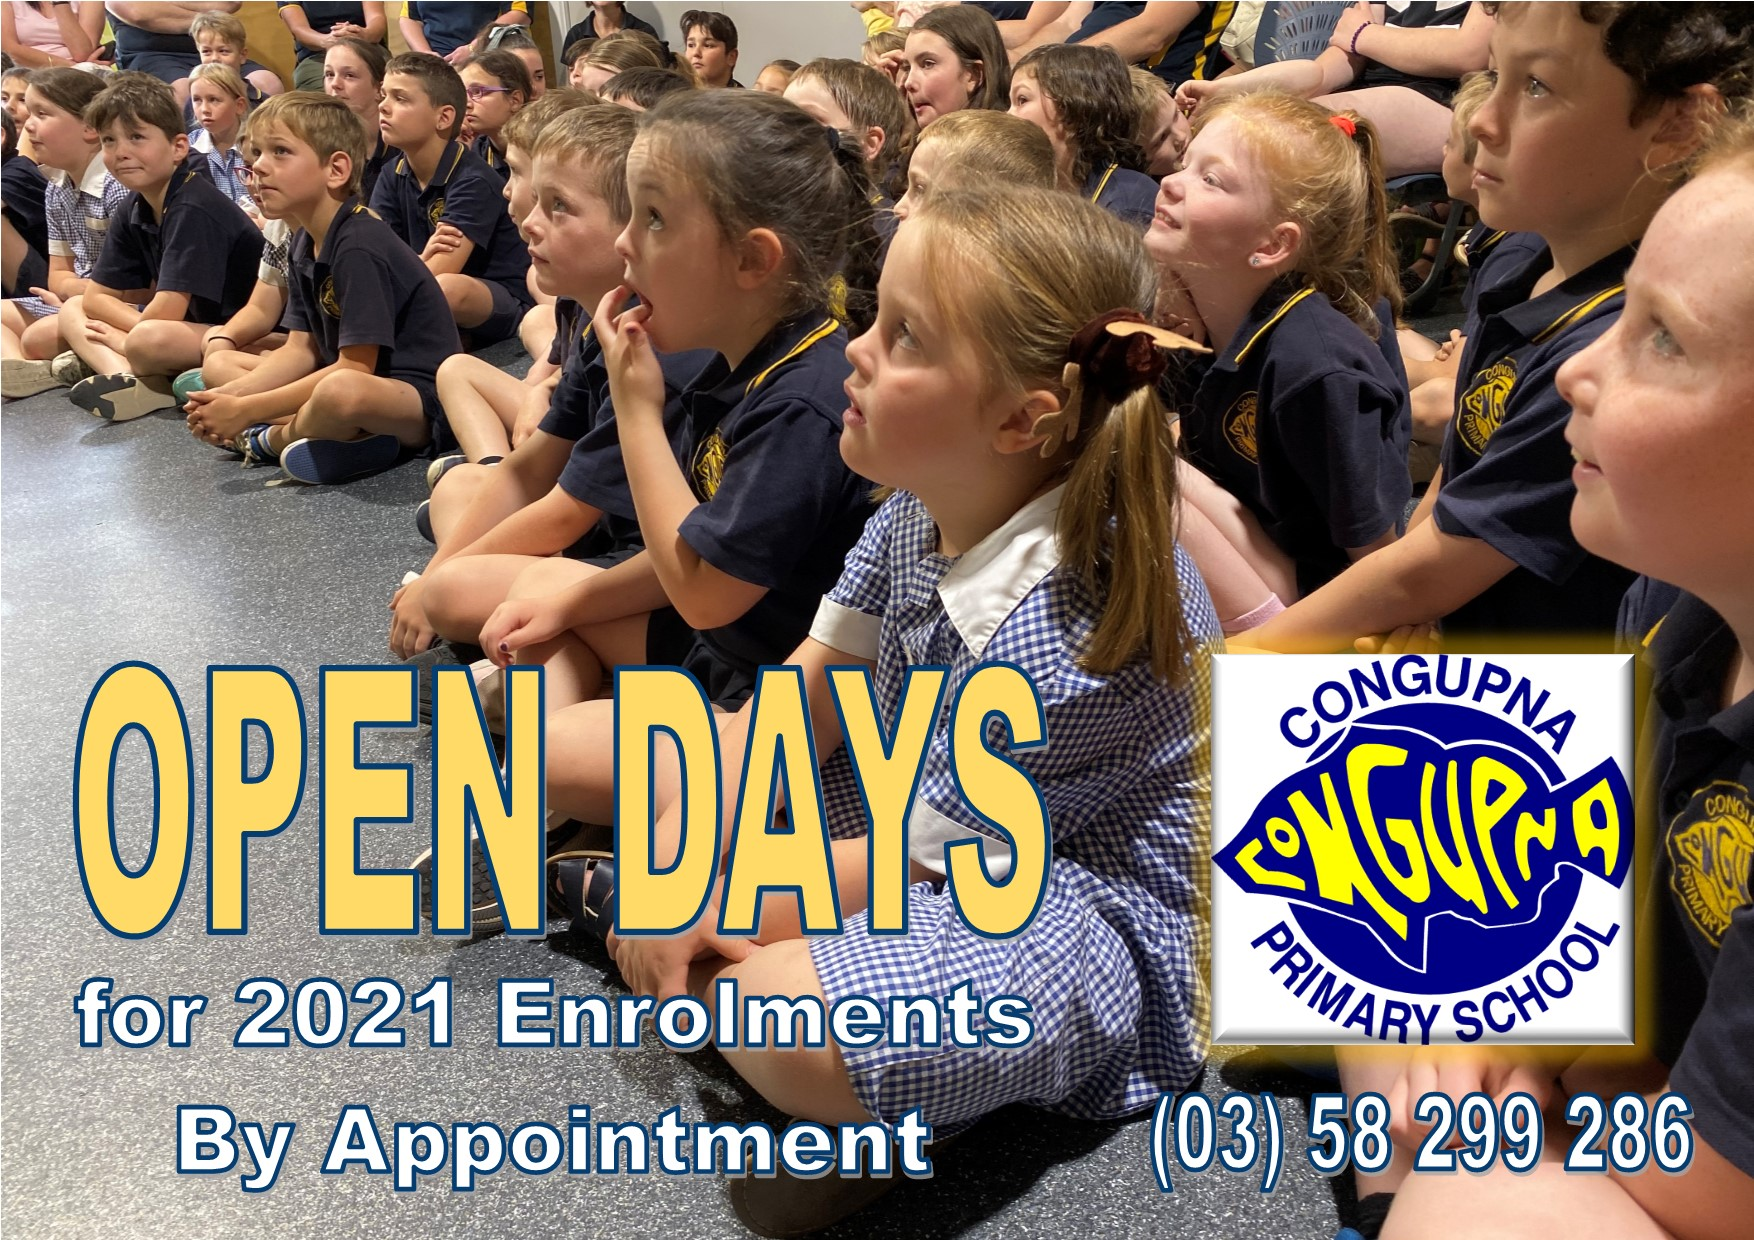 2020 Open Days for 2021 Enrolments Flyer